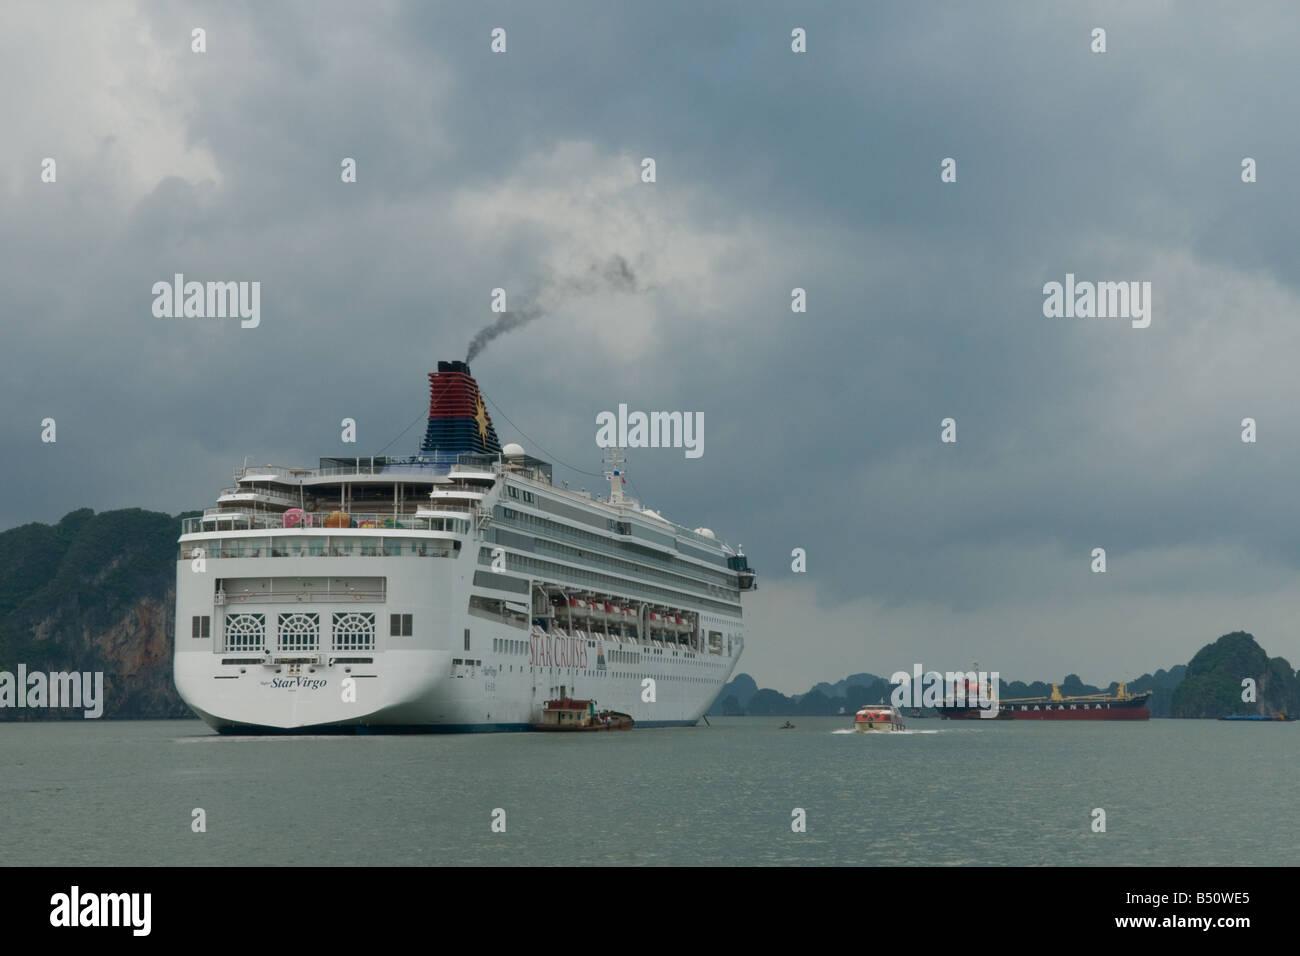 Large passenger cruise ship ('Super Star Virgo' from 'Star Cruises') in Halong Bay, Vietnam - Stock Image